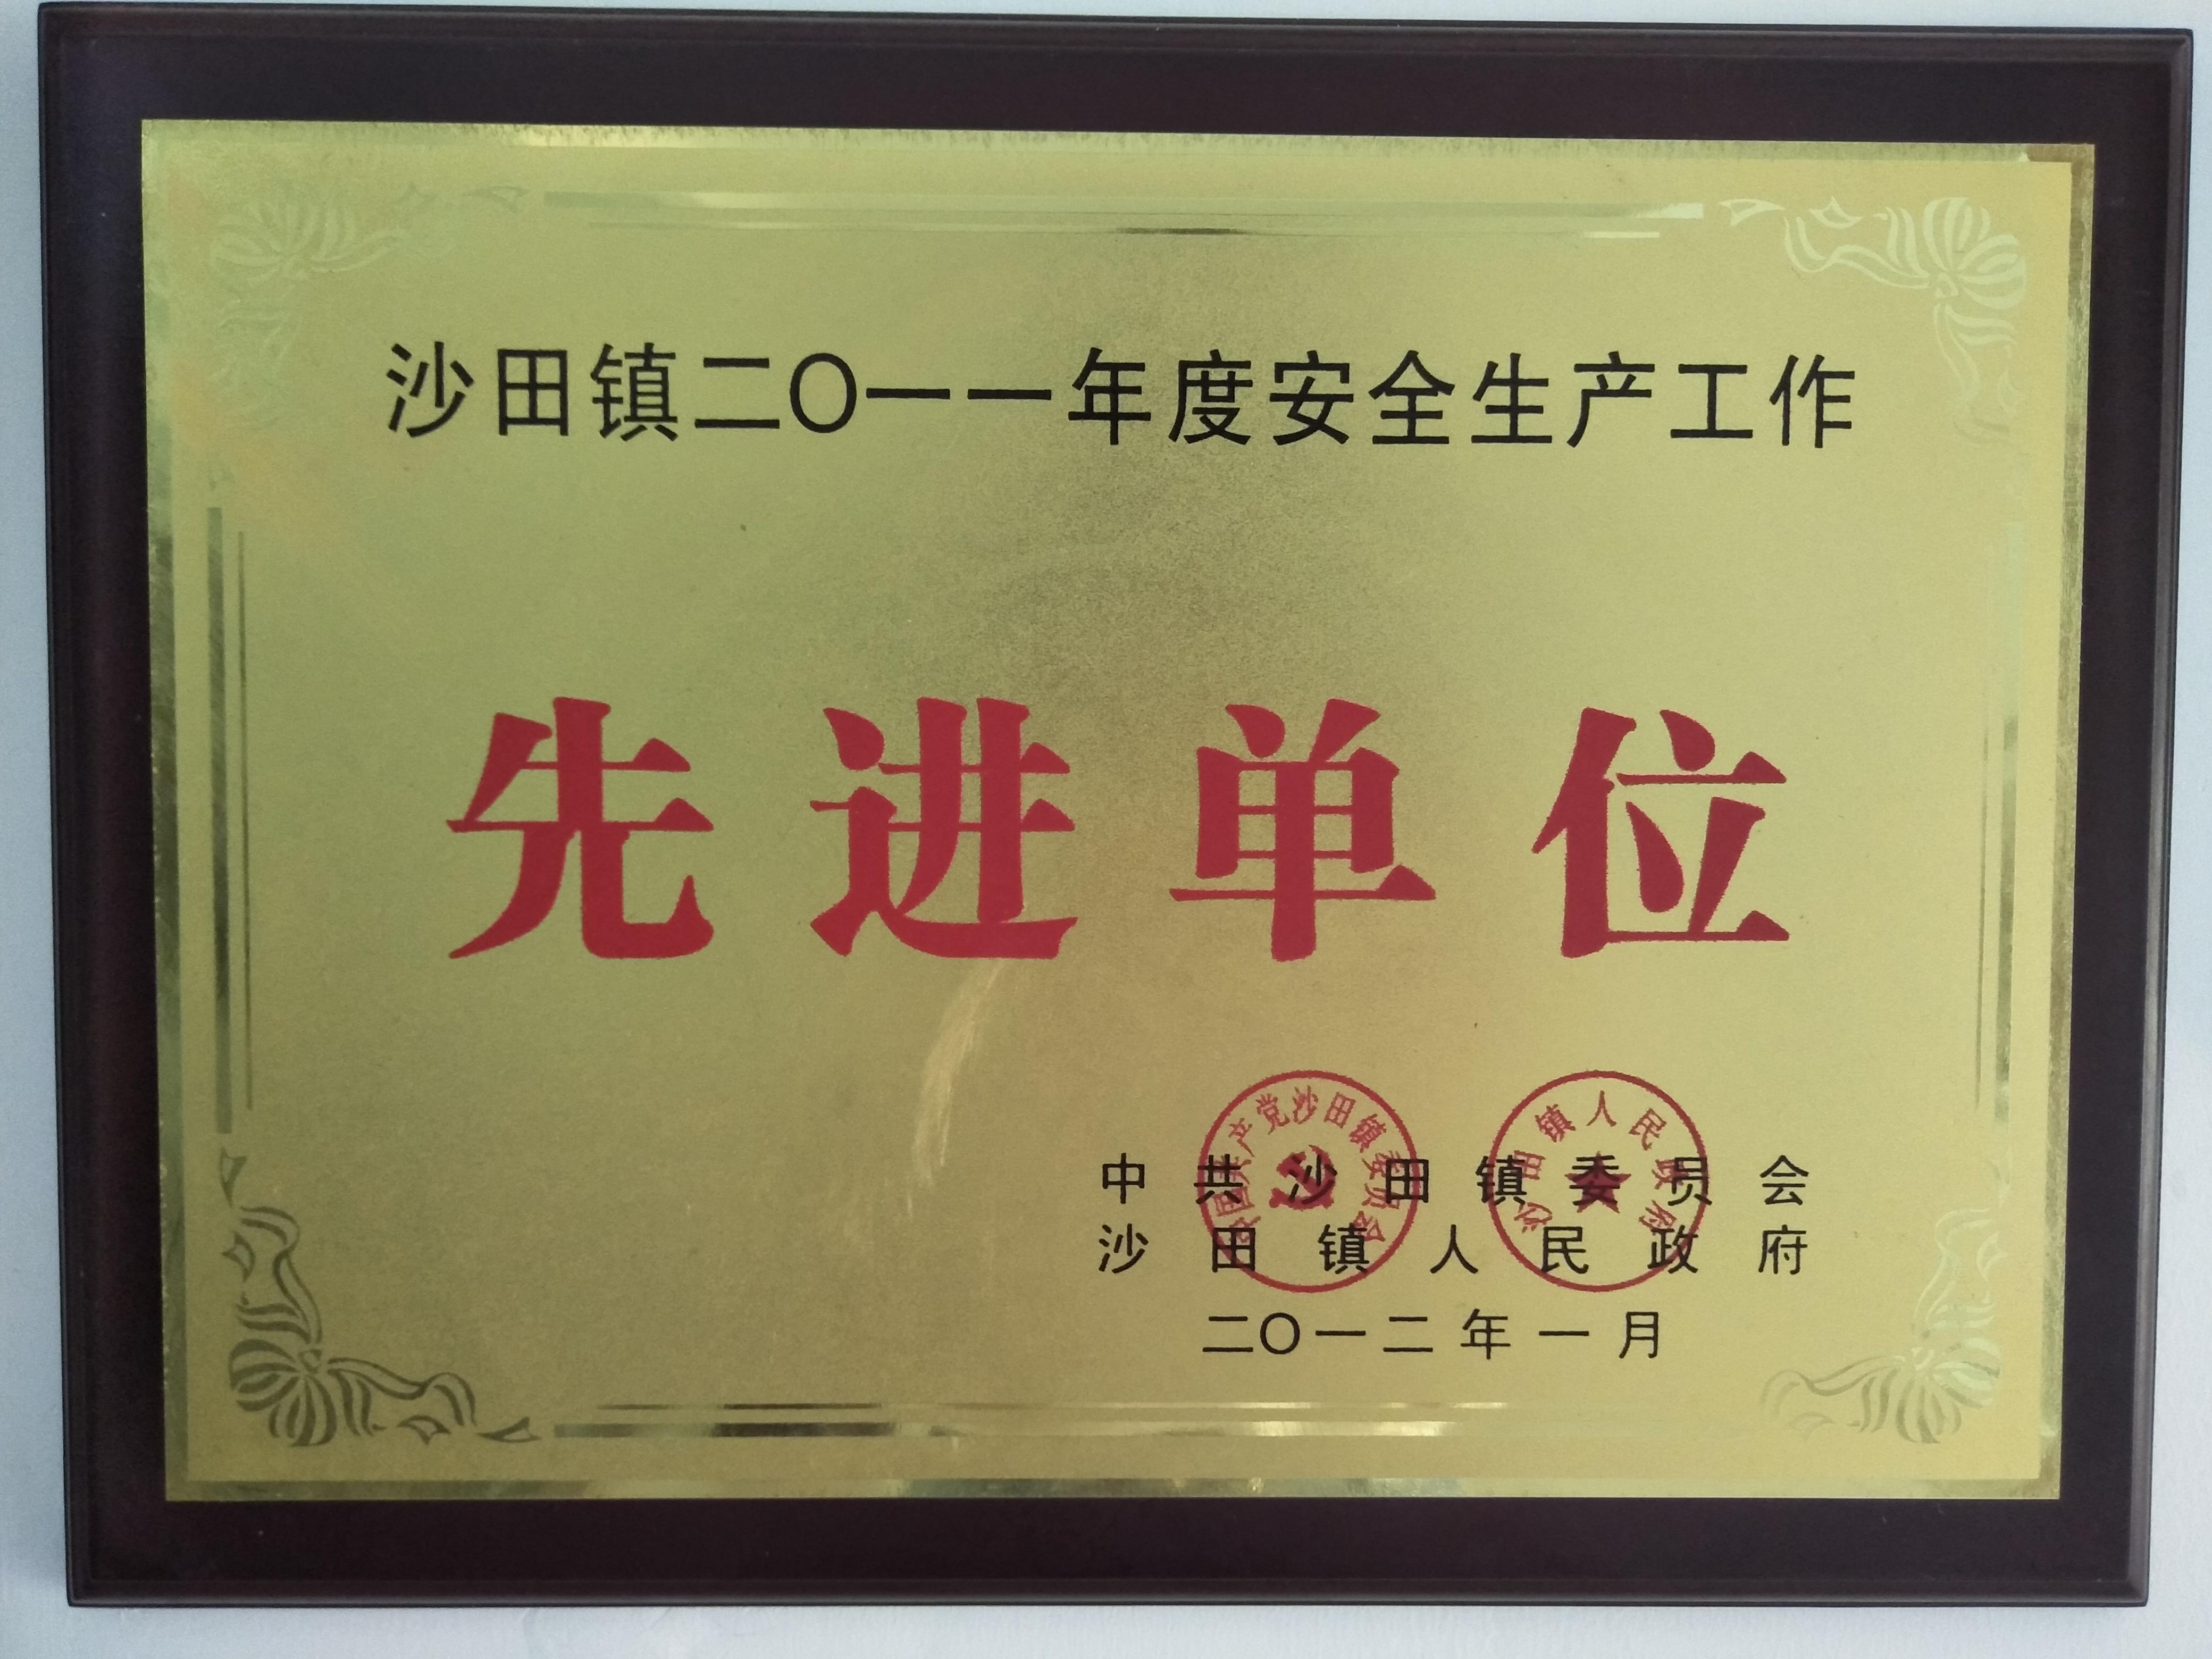 Advanced Unit Certification